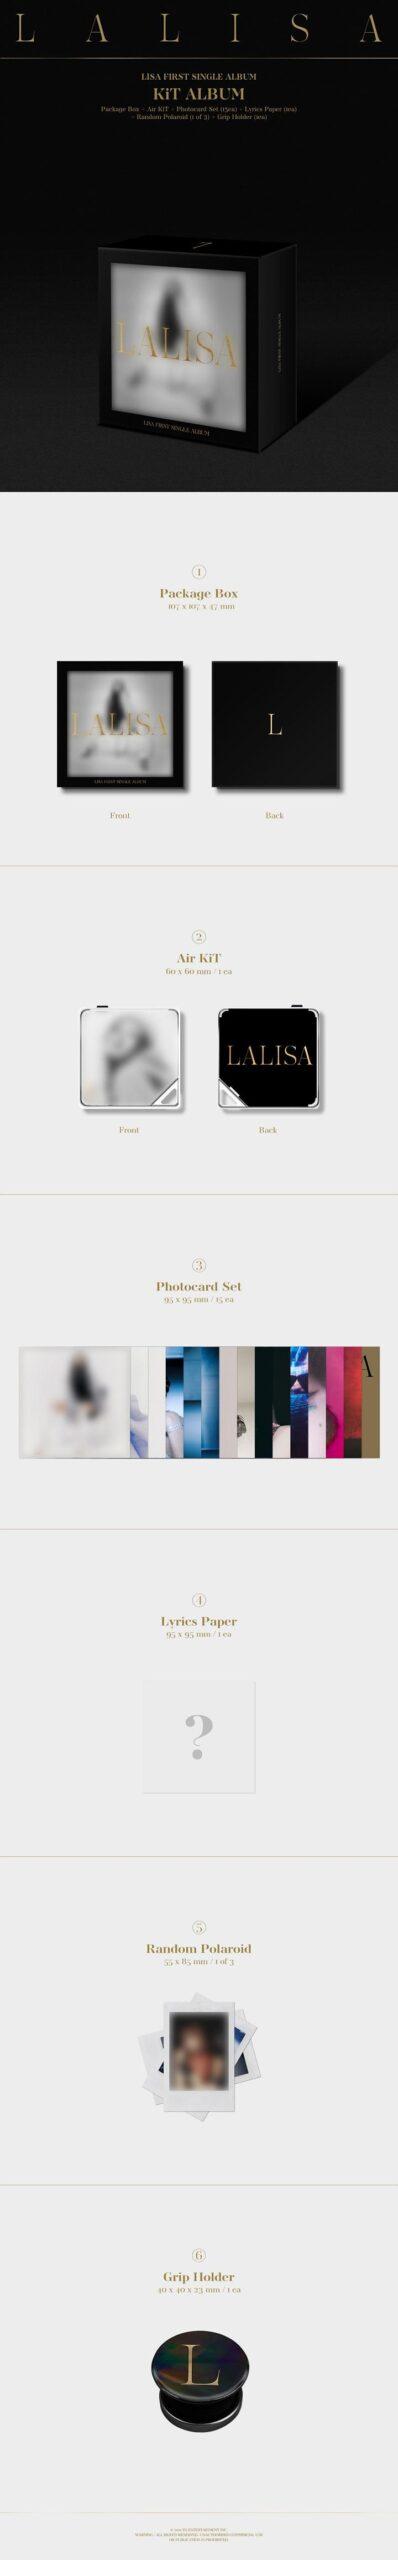 1st Single Album de LISA BLACKPINK LALISA KIT Ver.